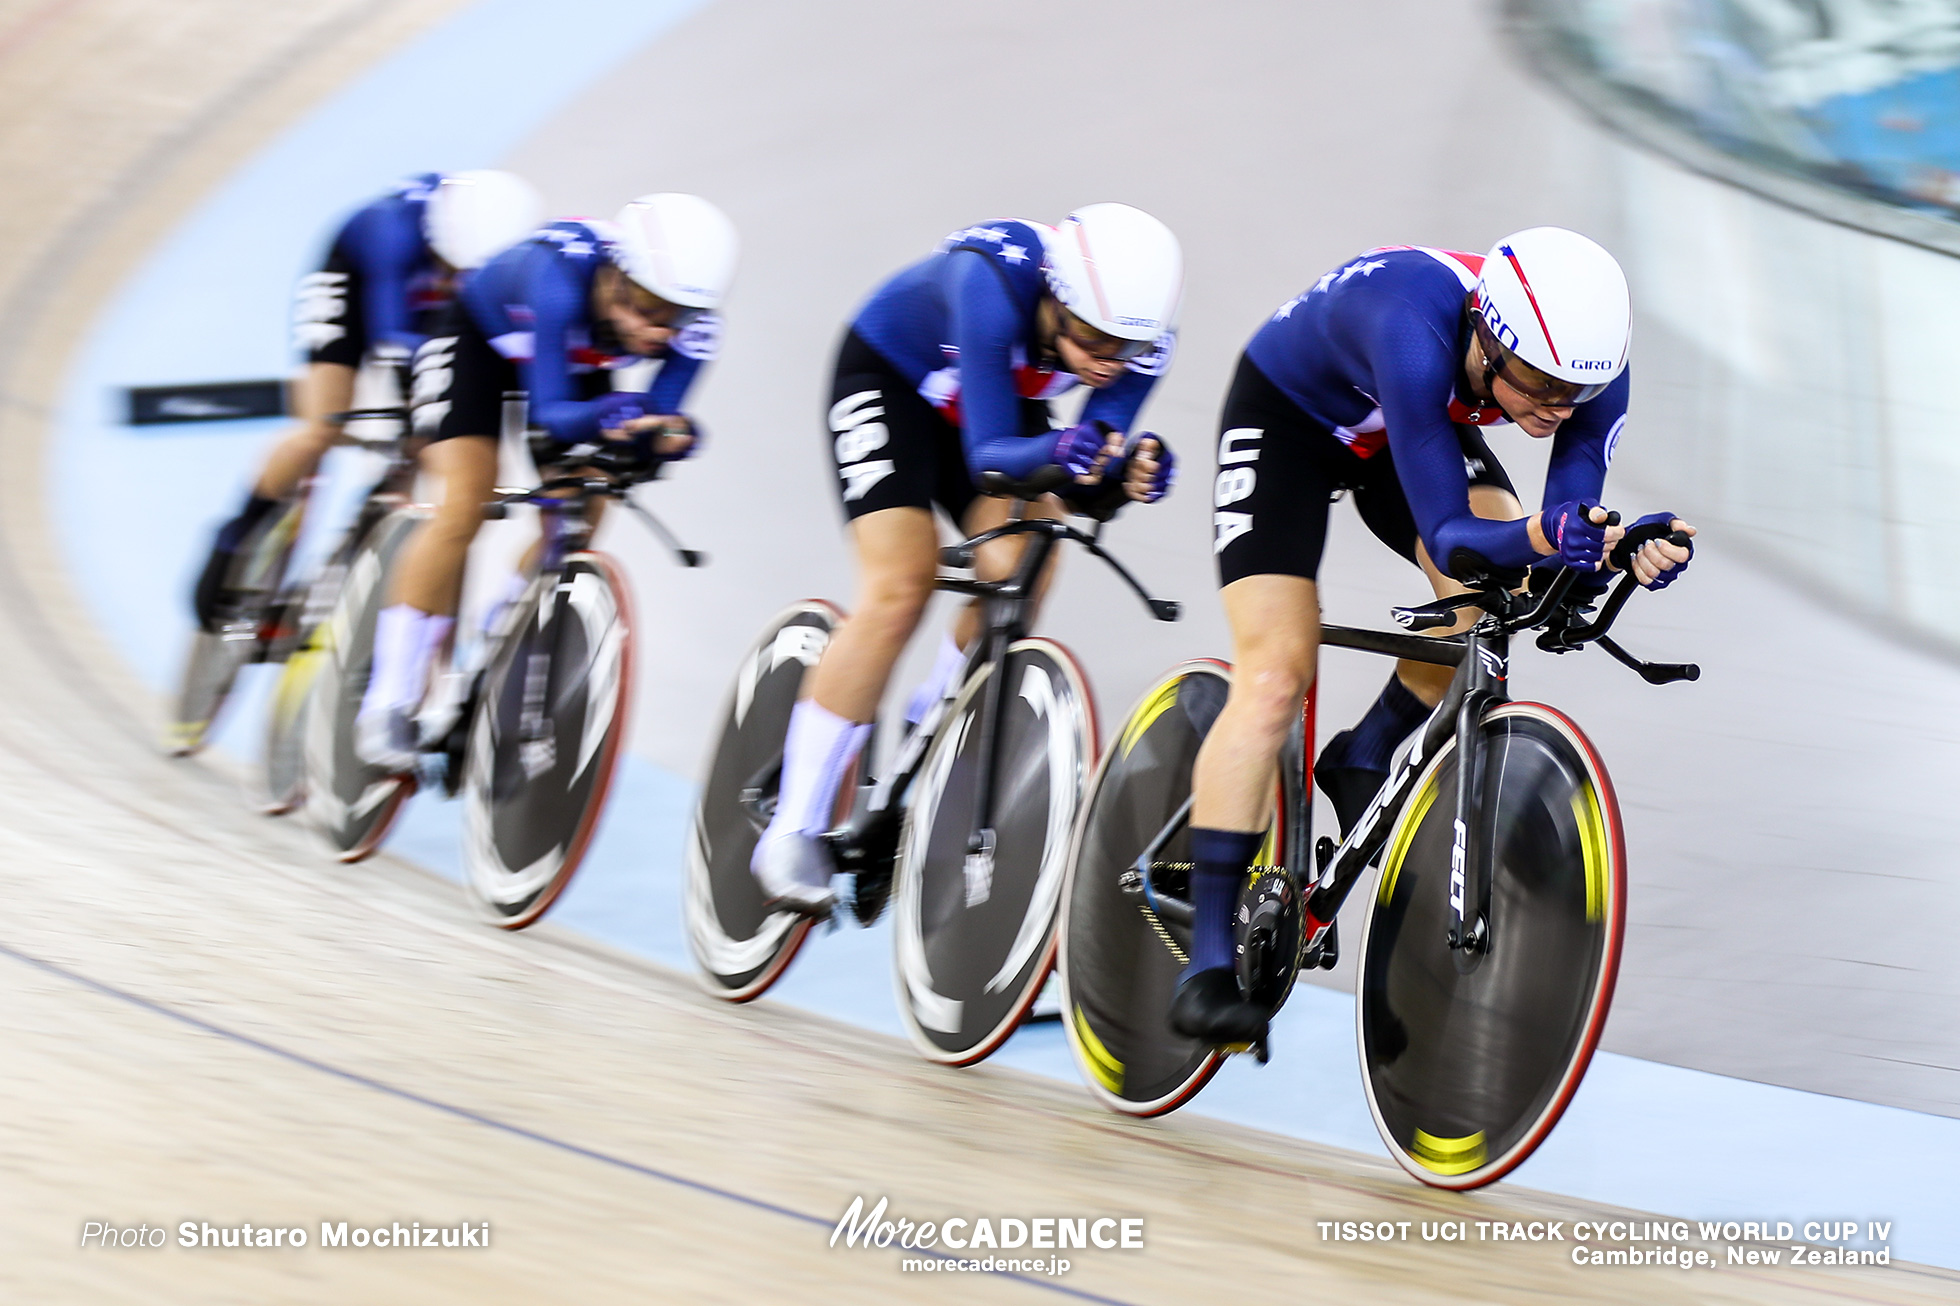 1st Round / Women's Team Pursuit / TISSOT UCI TRACK CYCLING WORLD CUP IV, Cambridge, New Zealand, Christina BIRCH クリスティーナ・バーチ Jennifer VALENTE ジェニファー・バレンテ Emma WHITE エマ・ホワイト Lily WILLIAMS リリー・ウィリアムズ